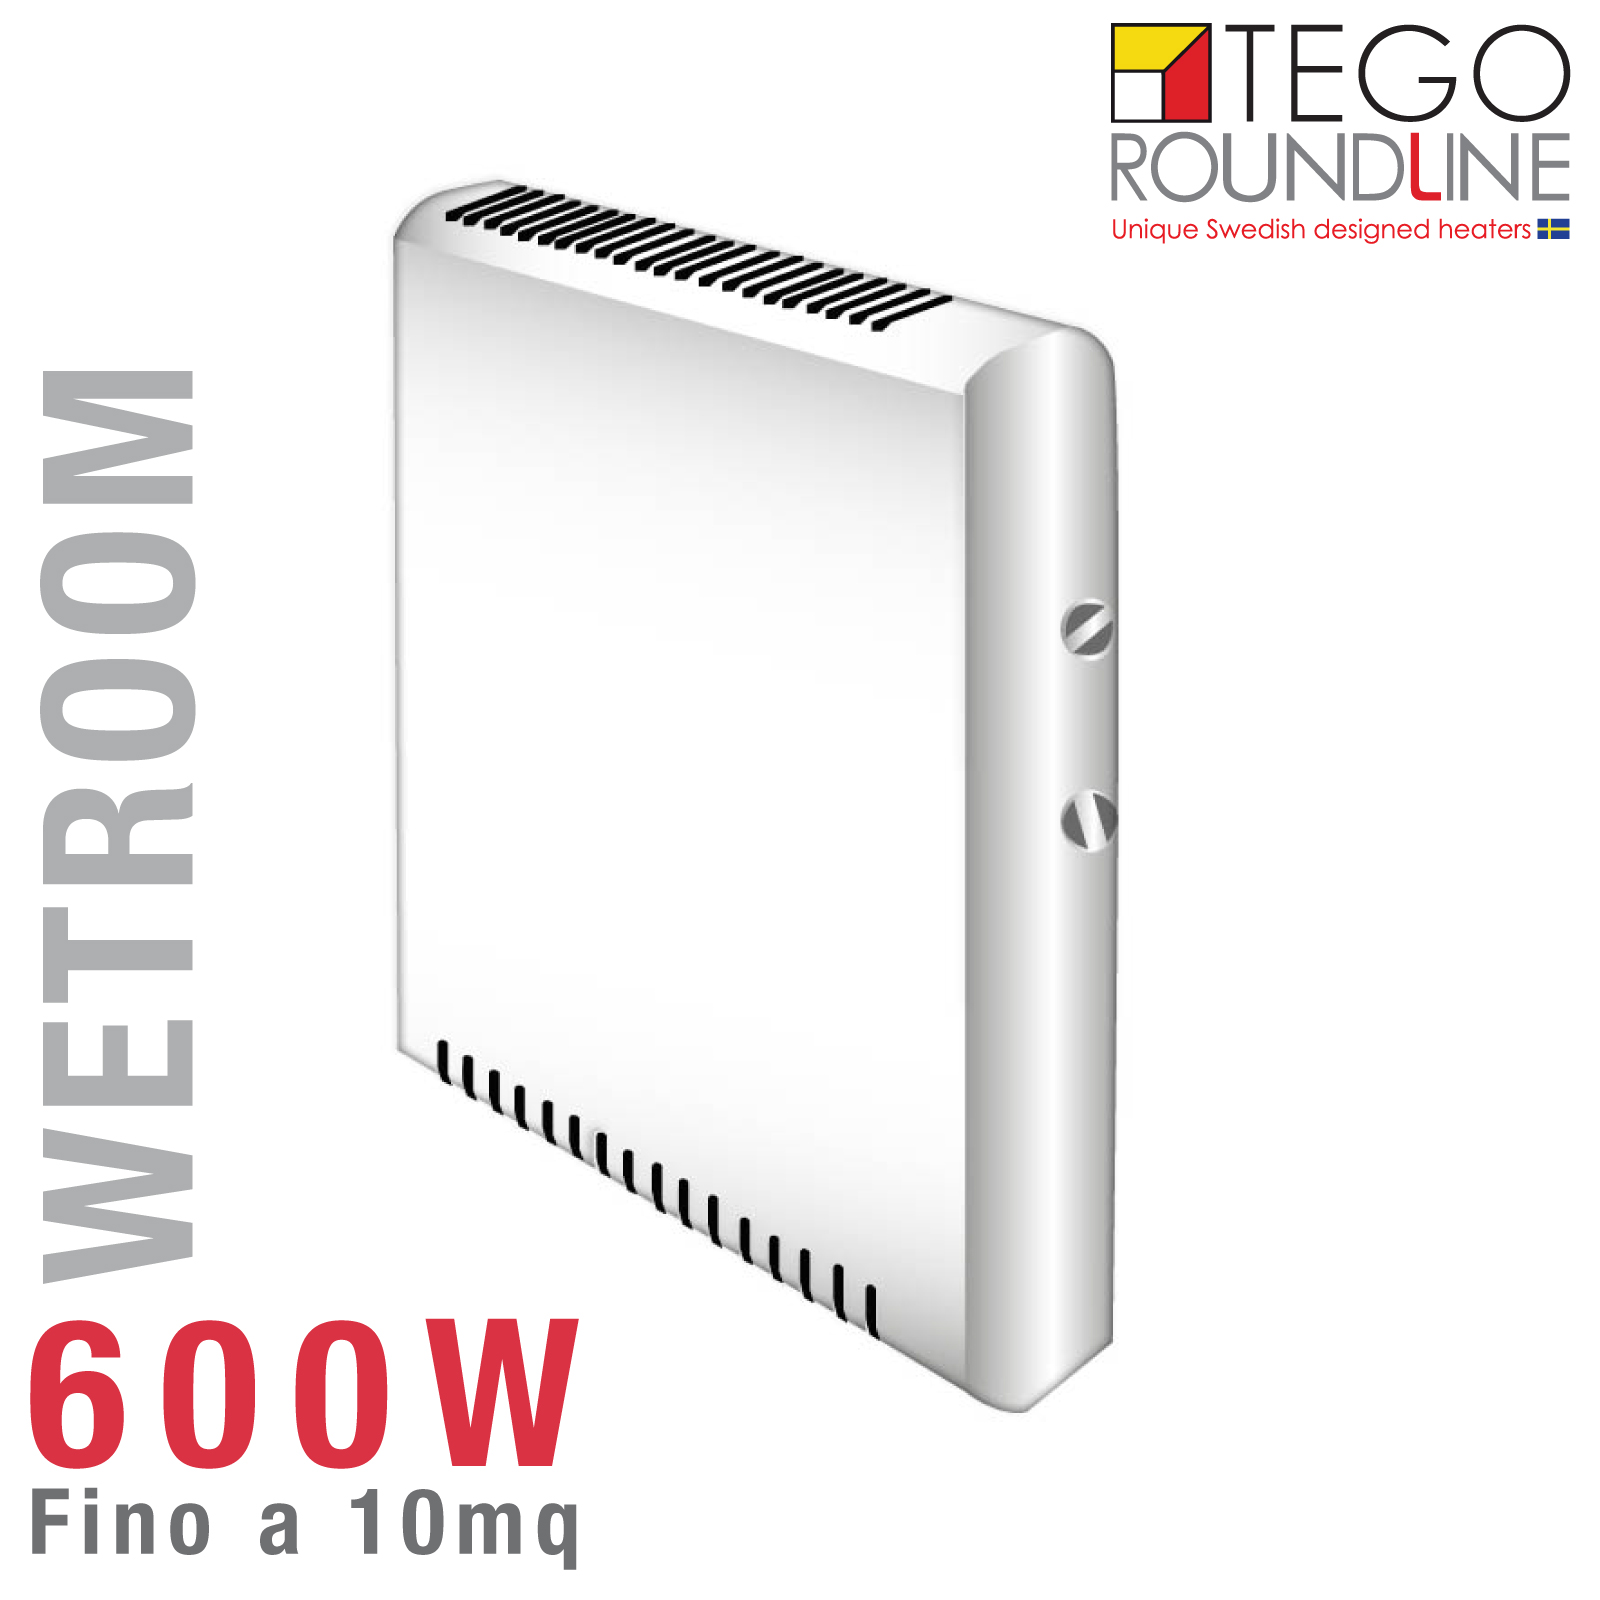 IoRisparmioEnergia-Radiatore-Elettrico-Svedese-TEGO-2019-E8511410-600W-WETROOM